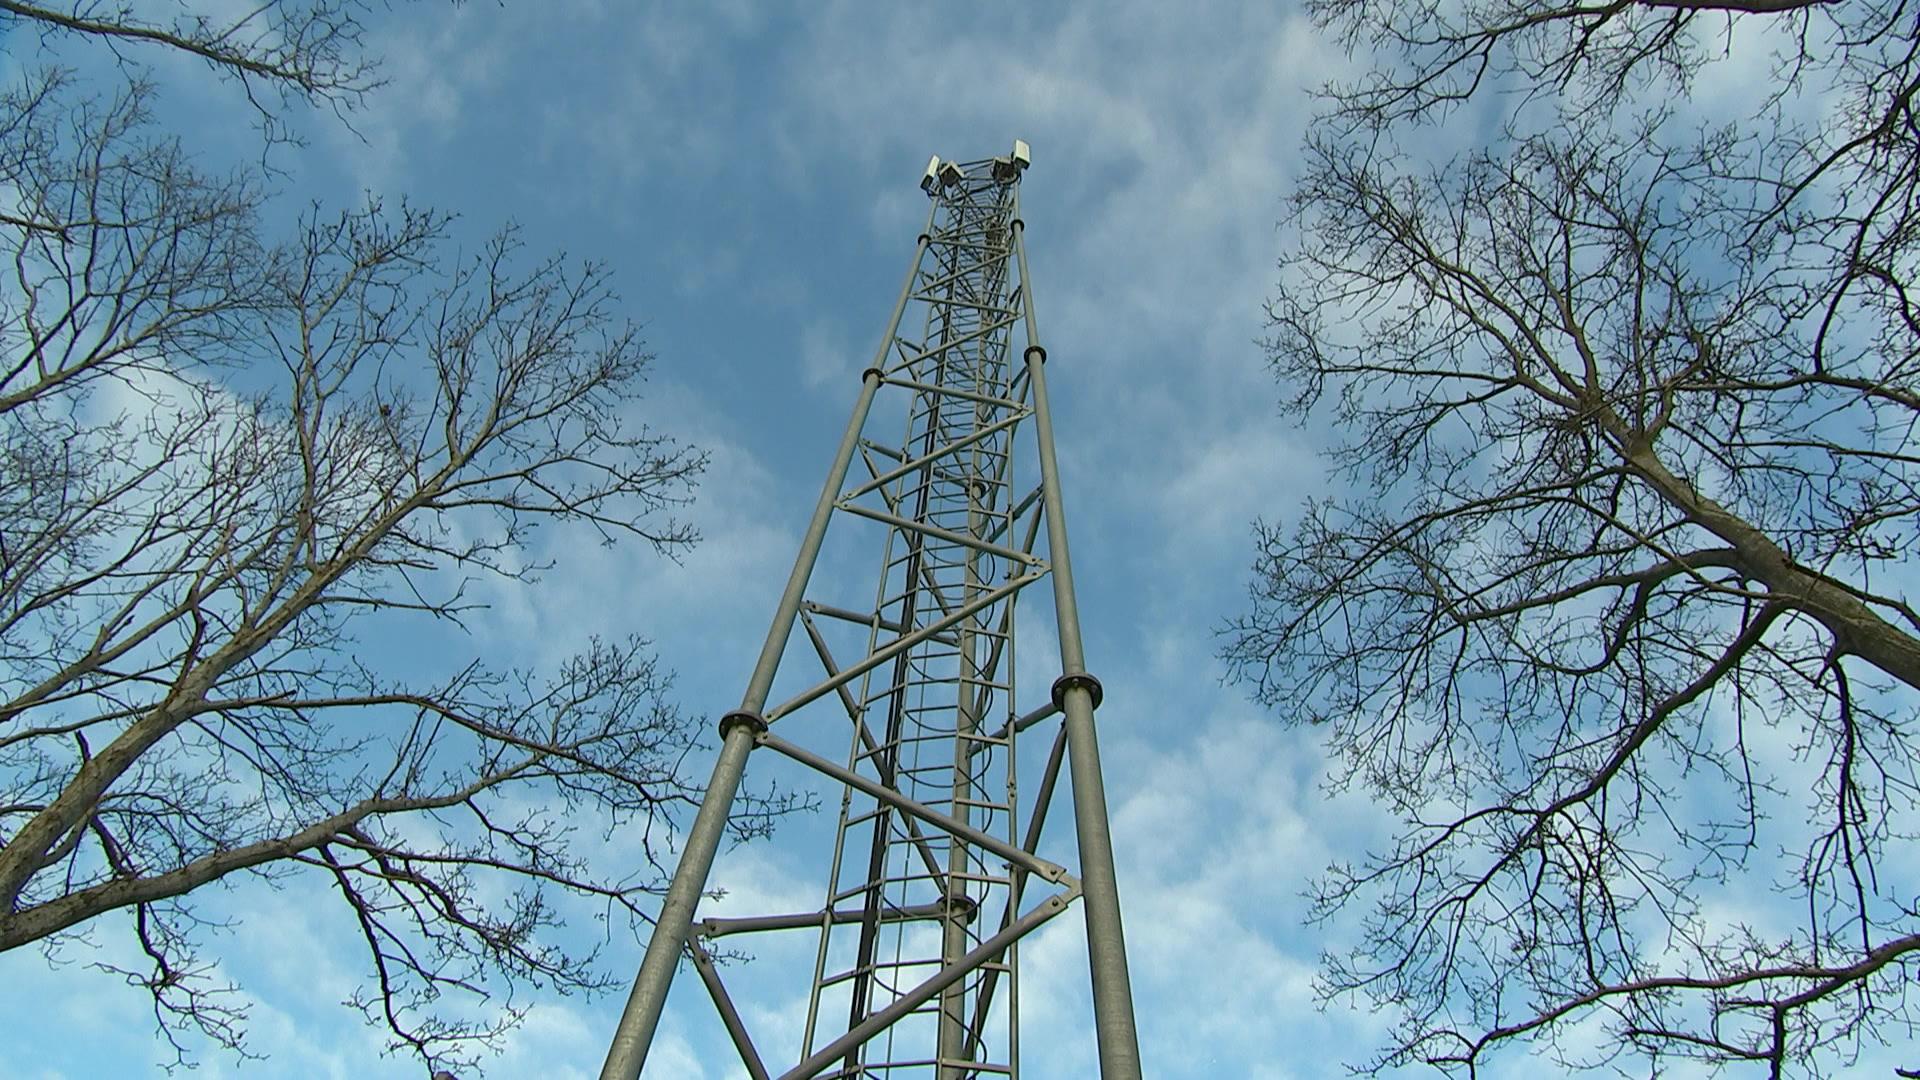 Nyt telenet udnytter eksisterende 4G-master til at sende ting og apparater på internettet.